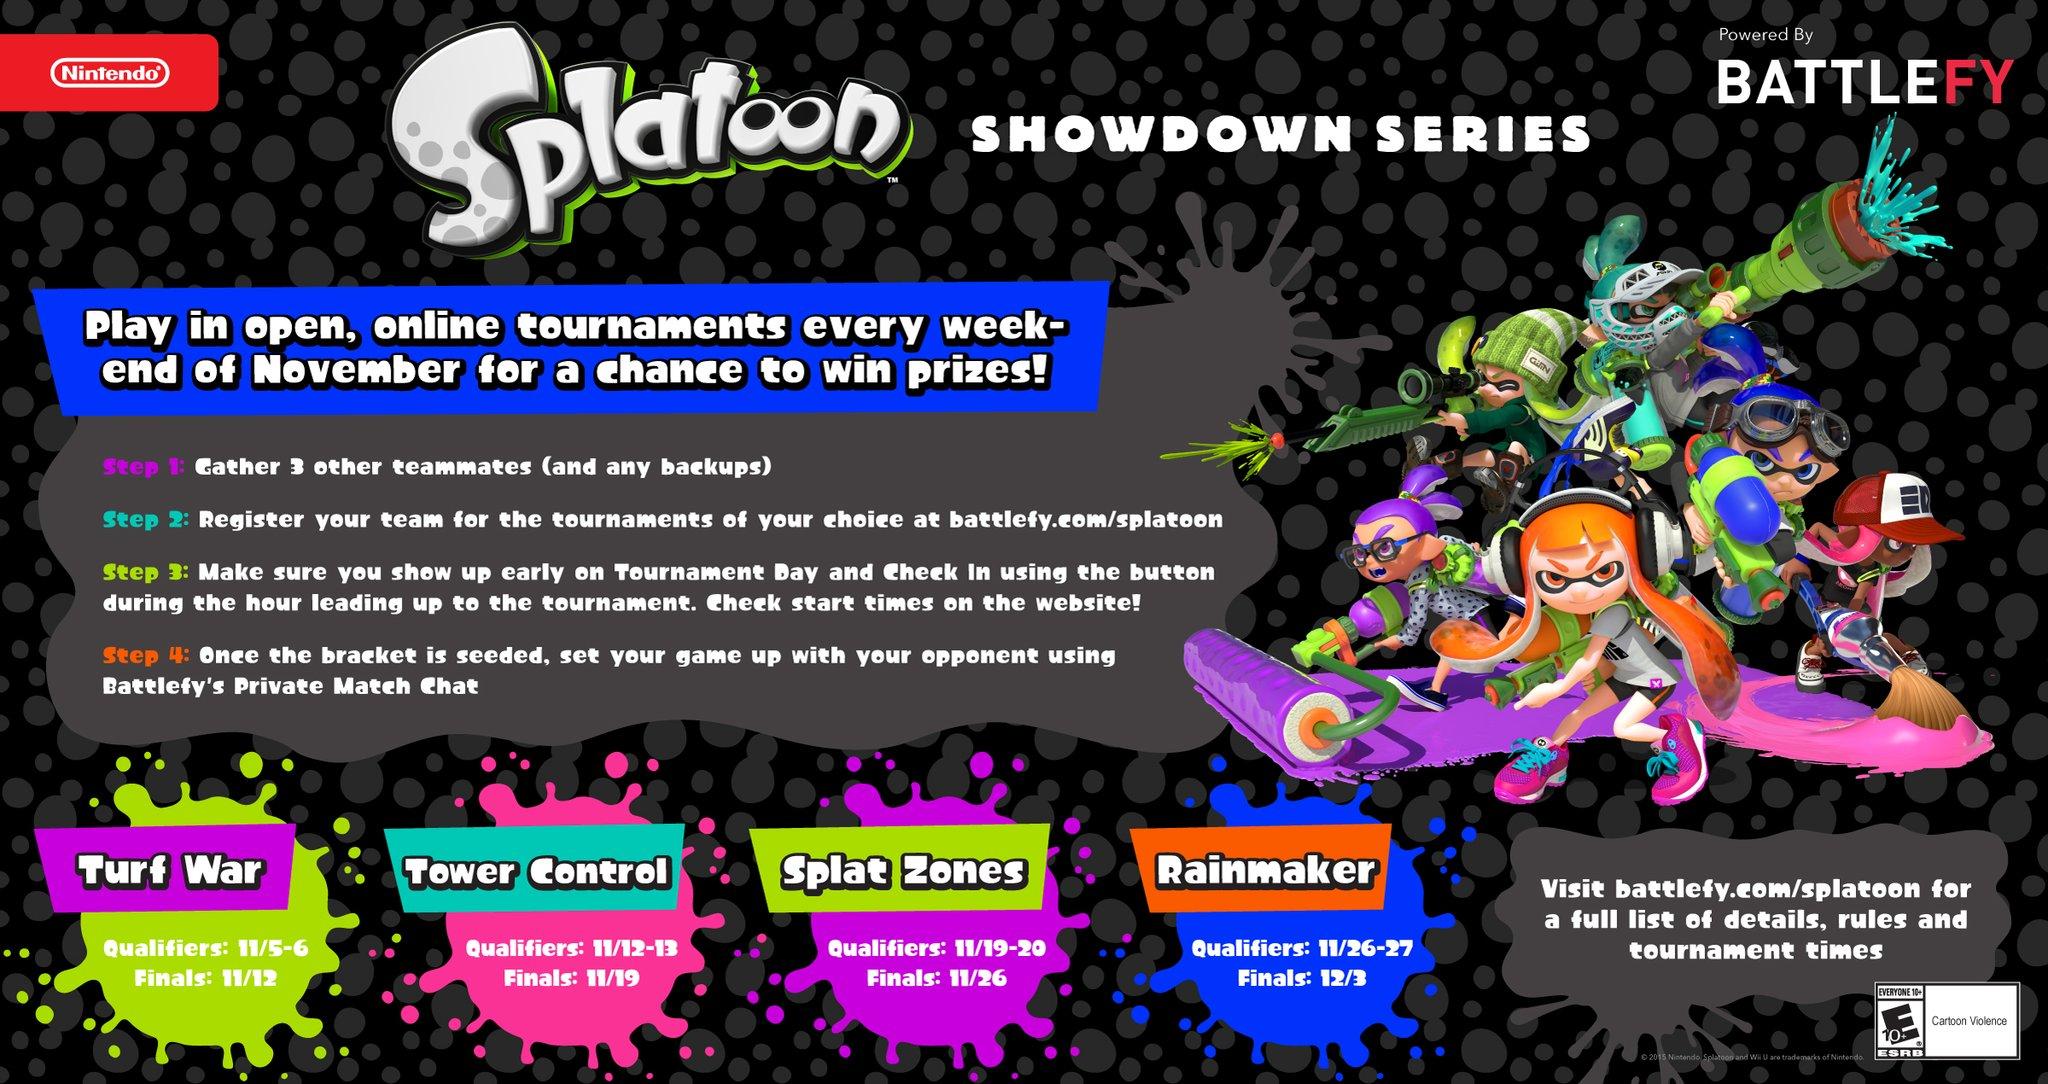 Splatoon Showdown.jpg